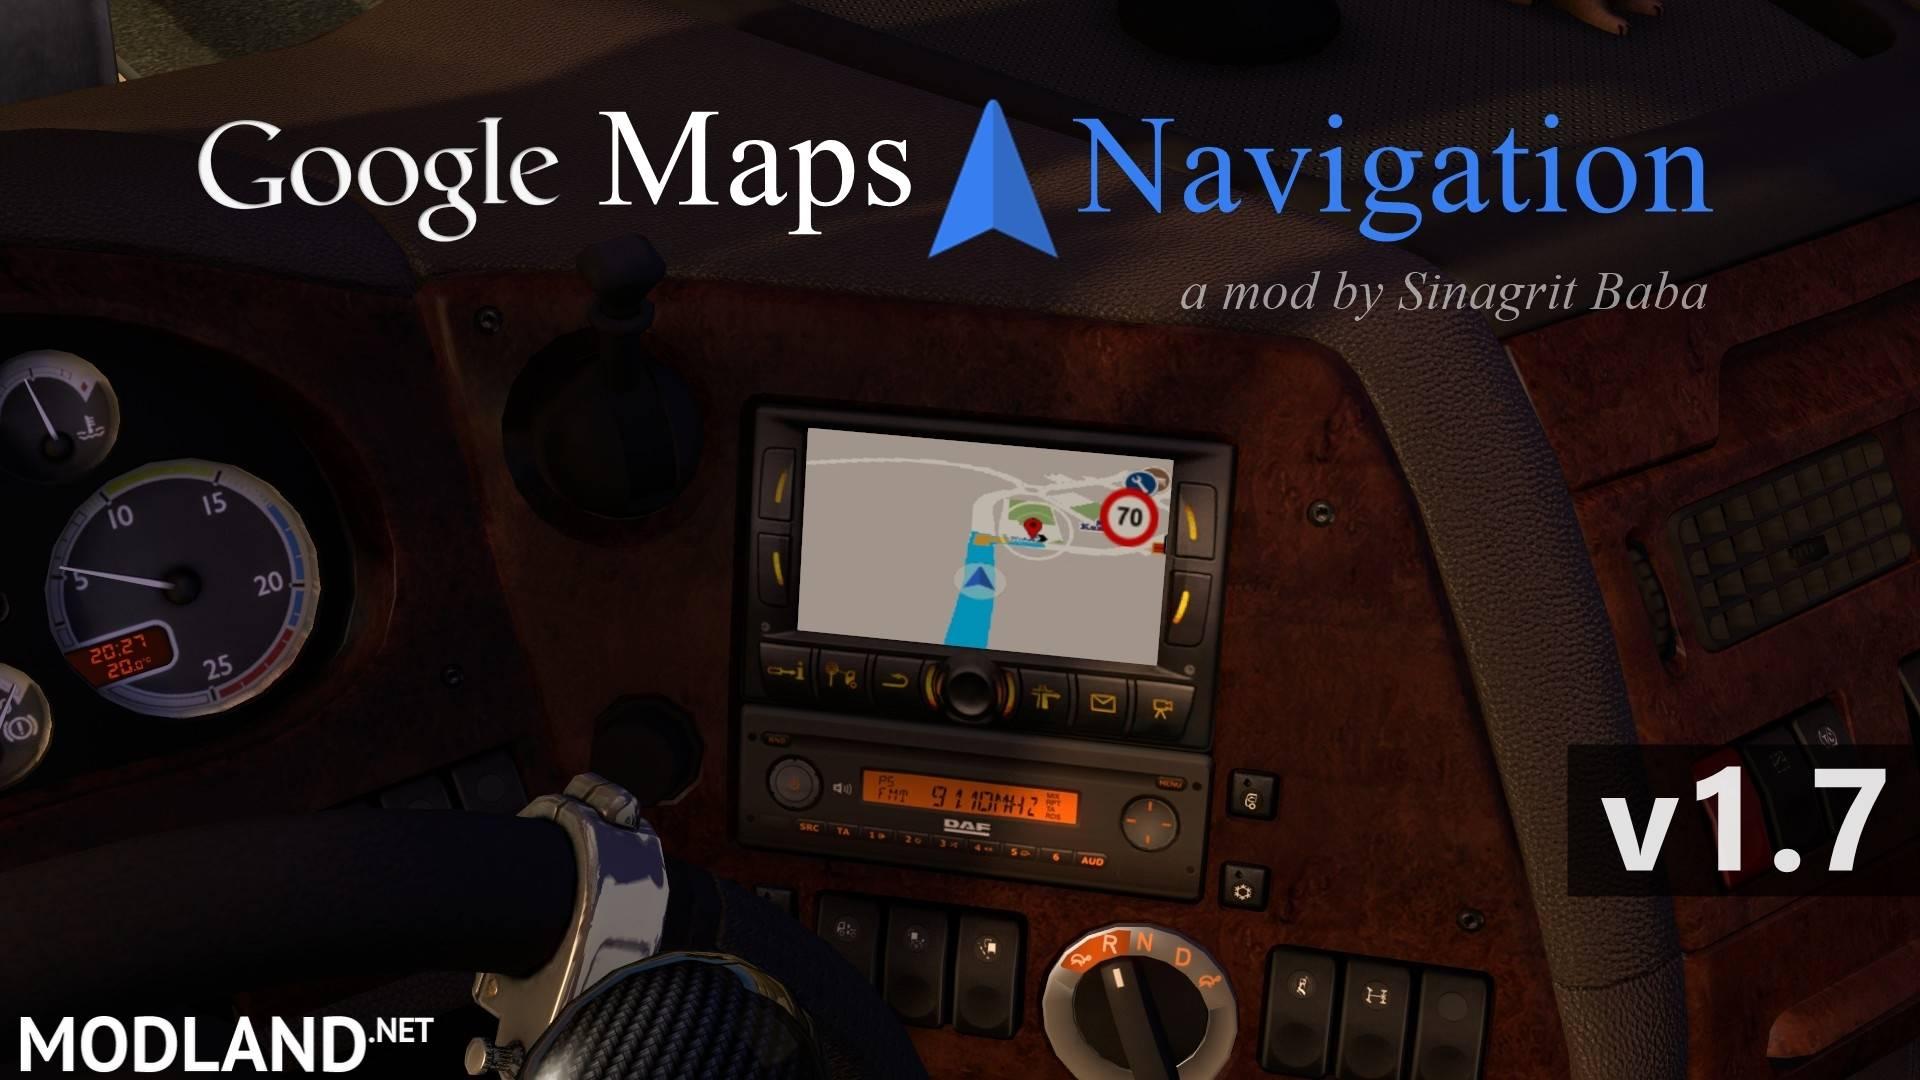 ETS 2 - Google Maps Navigation v 1.7 mod for ETS 2 Google Map Voices on your tone of voice, search by voice, lync voice, allstate voice, no voice, world voice, find your voice, adobe voice, aflac voice, android voice, passive voice,